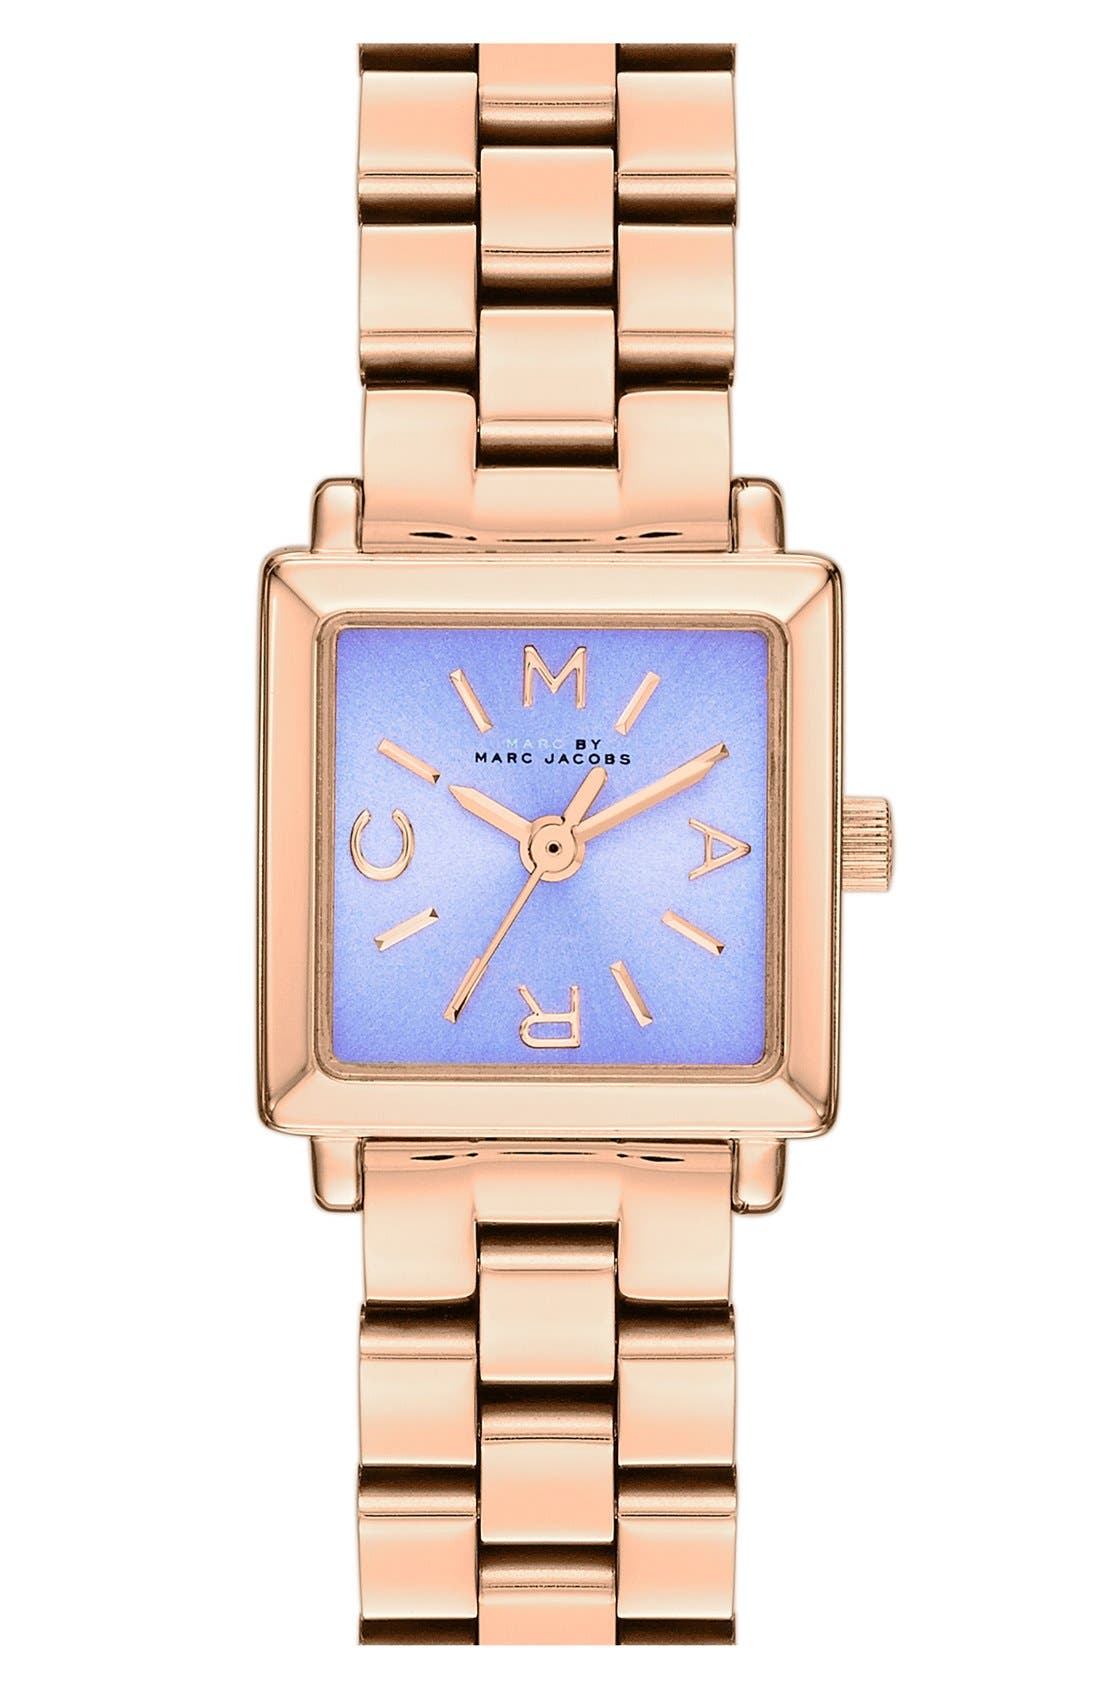 Main Image - MARC JACOBS 'Katherine' Square Dial Bracelet Watch, 19mm